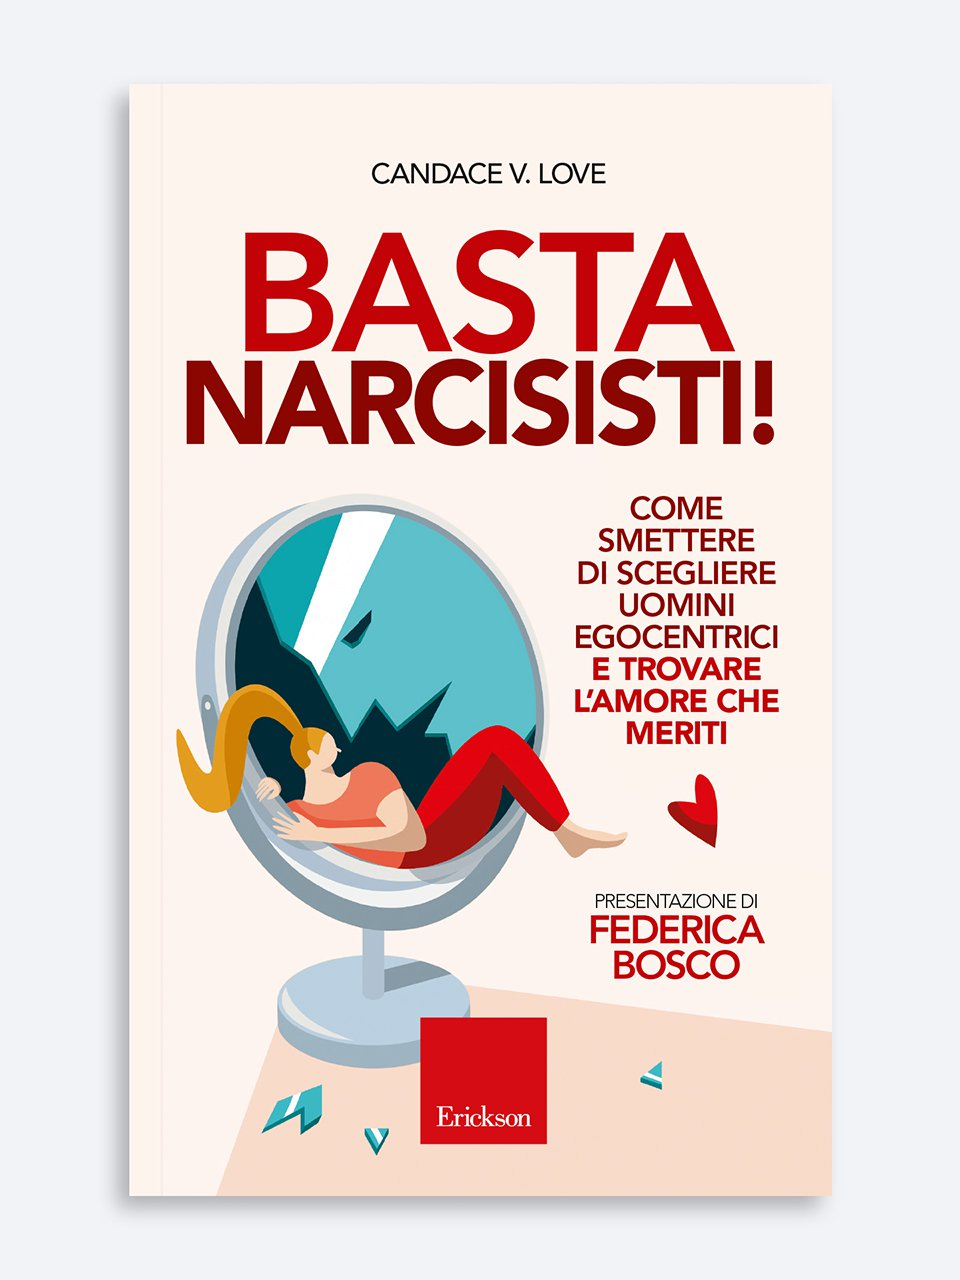 Basta narcisisti! - Programma Mindfulness - Libri - Erickson